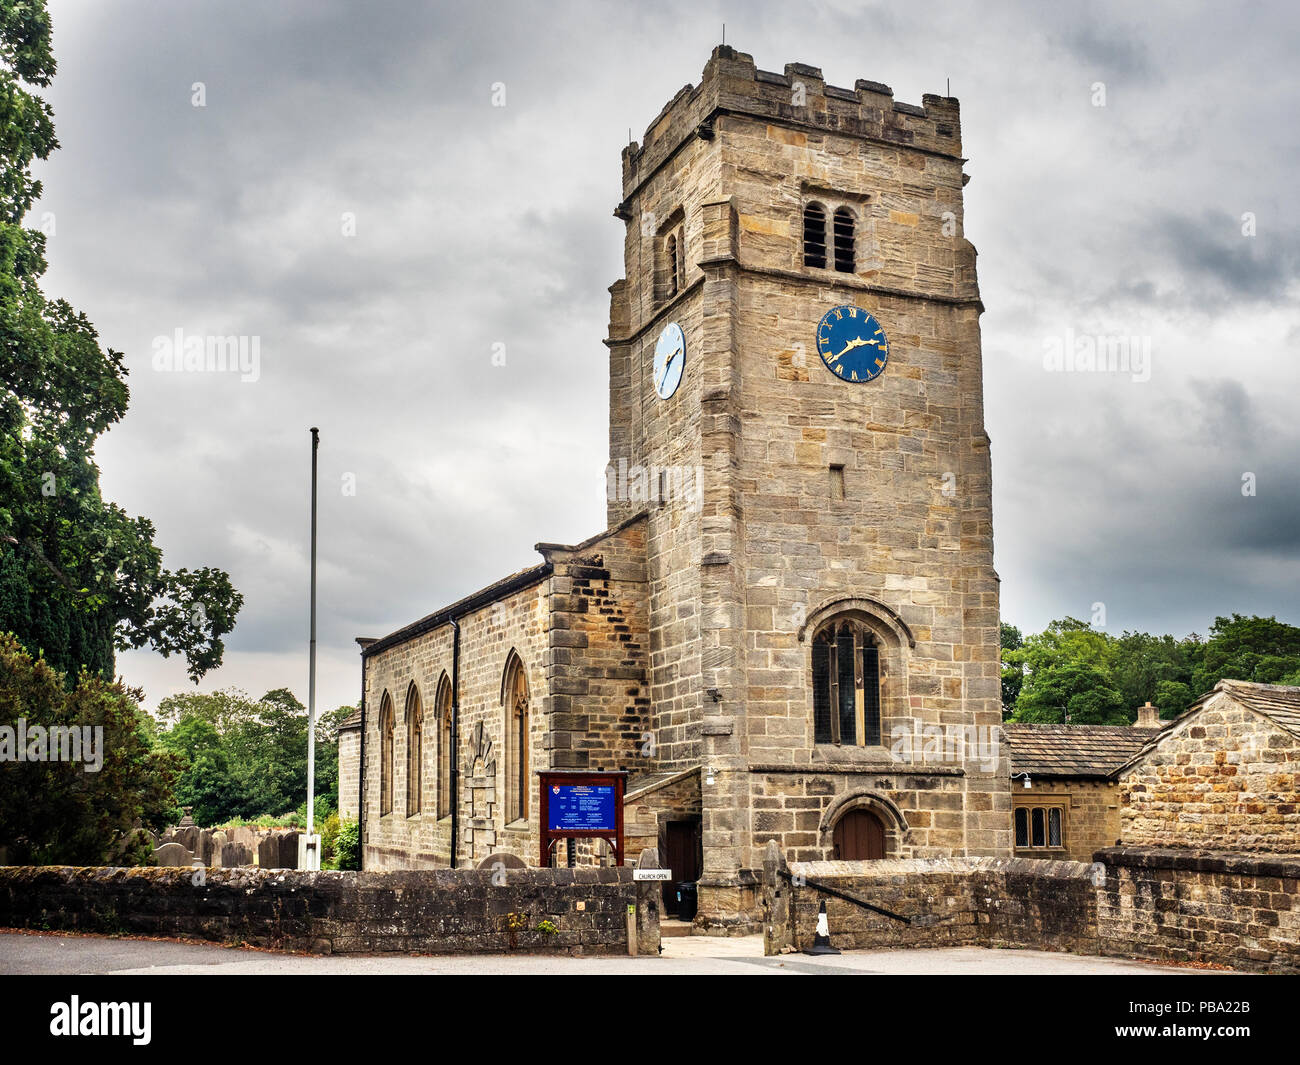 San Roberto de iglesia parroquial en Pannal Knaresborough Harrogate North Yorkshire Inglaterra Foto de stock